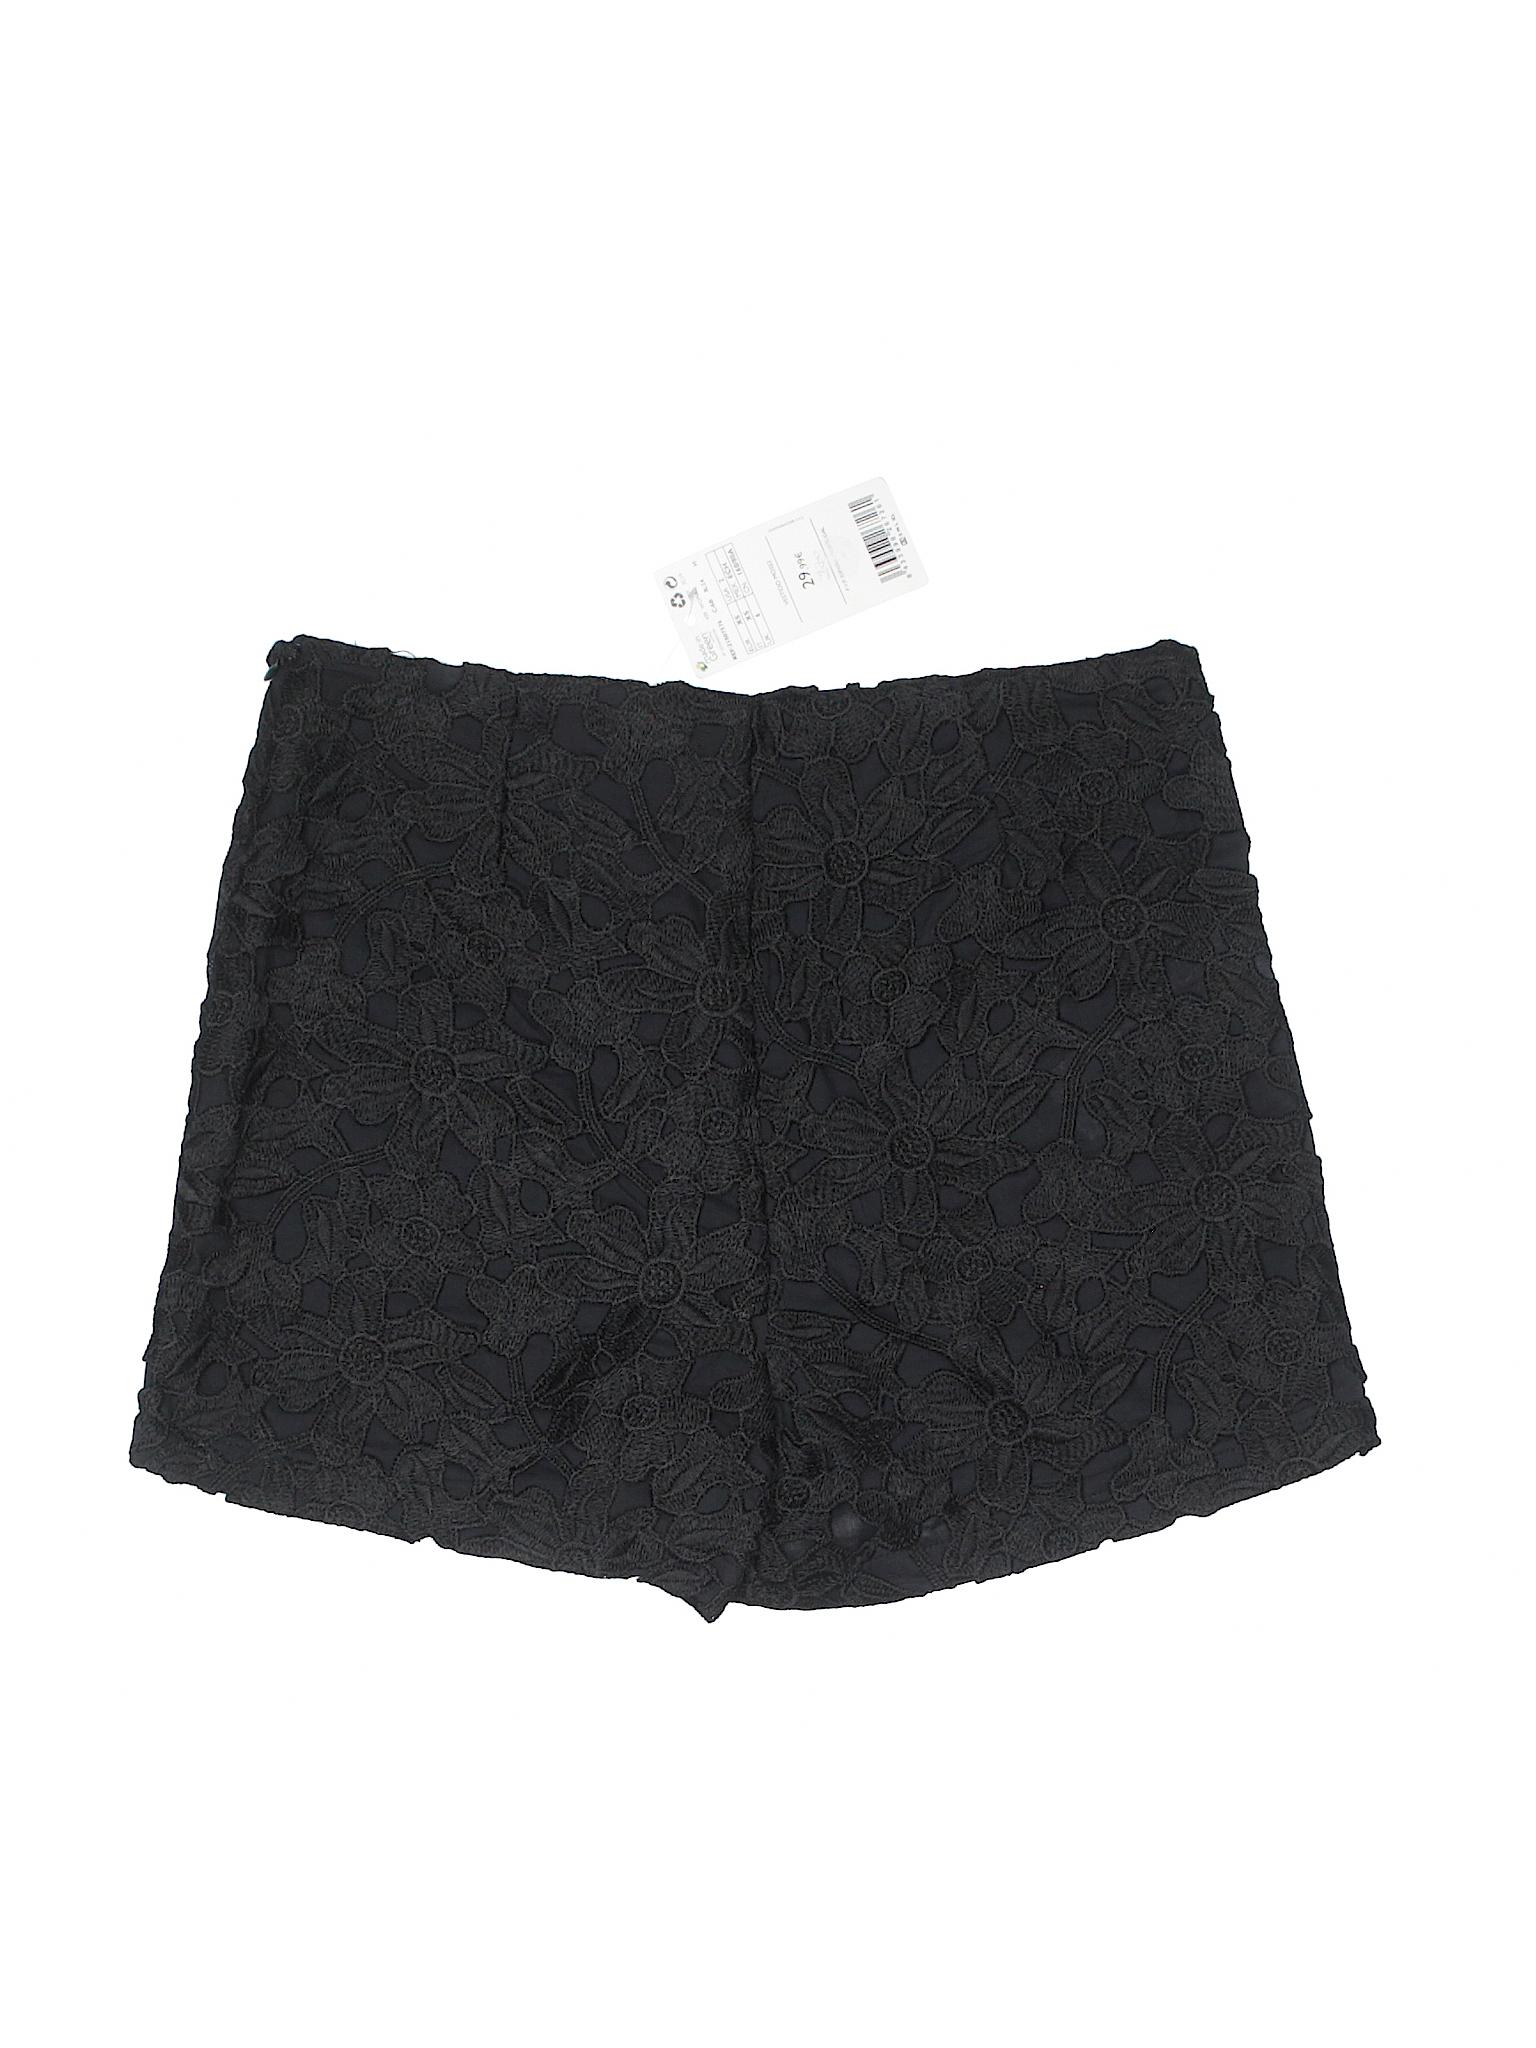 Boutique Boutique Shorts Mango Mango OS4RfqSc1